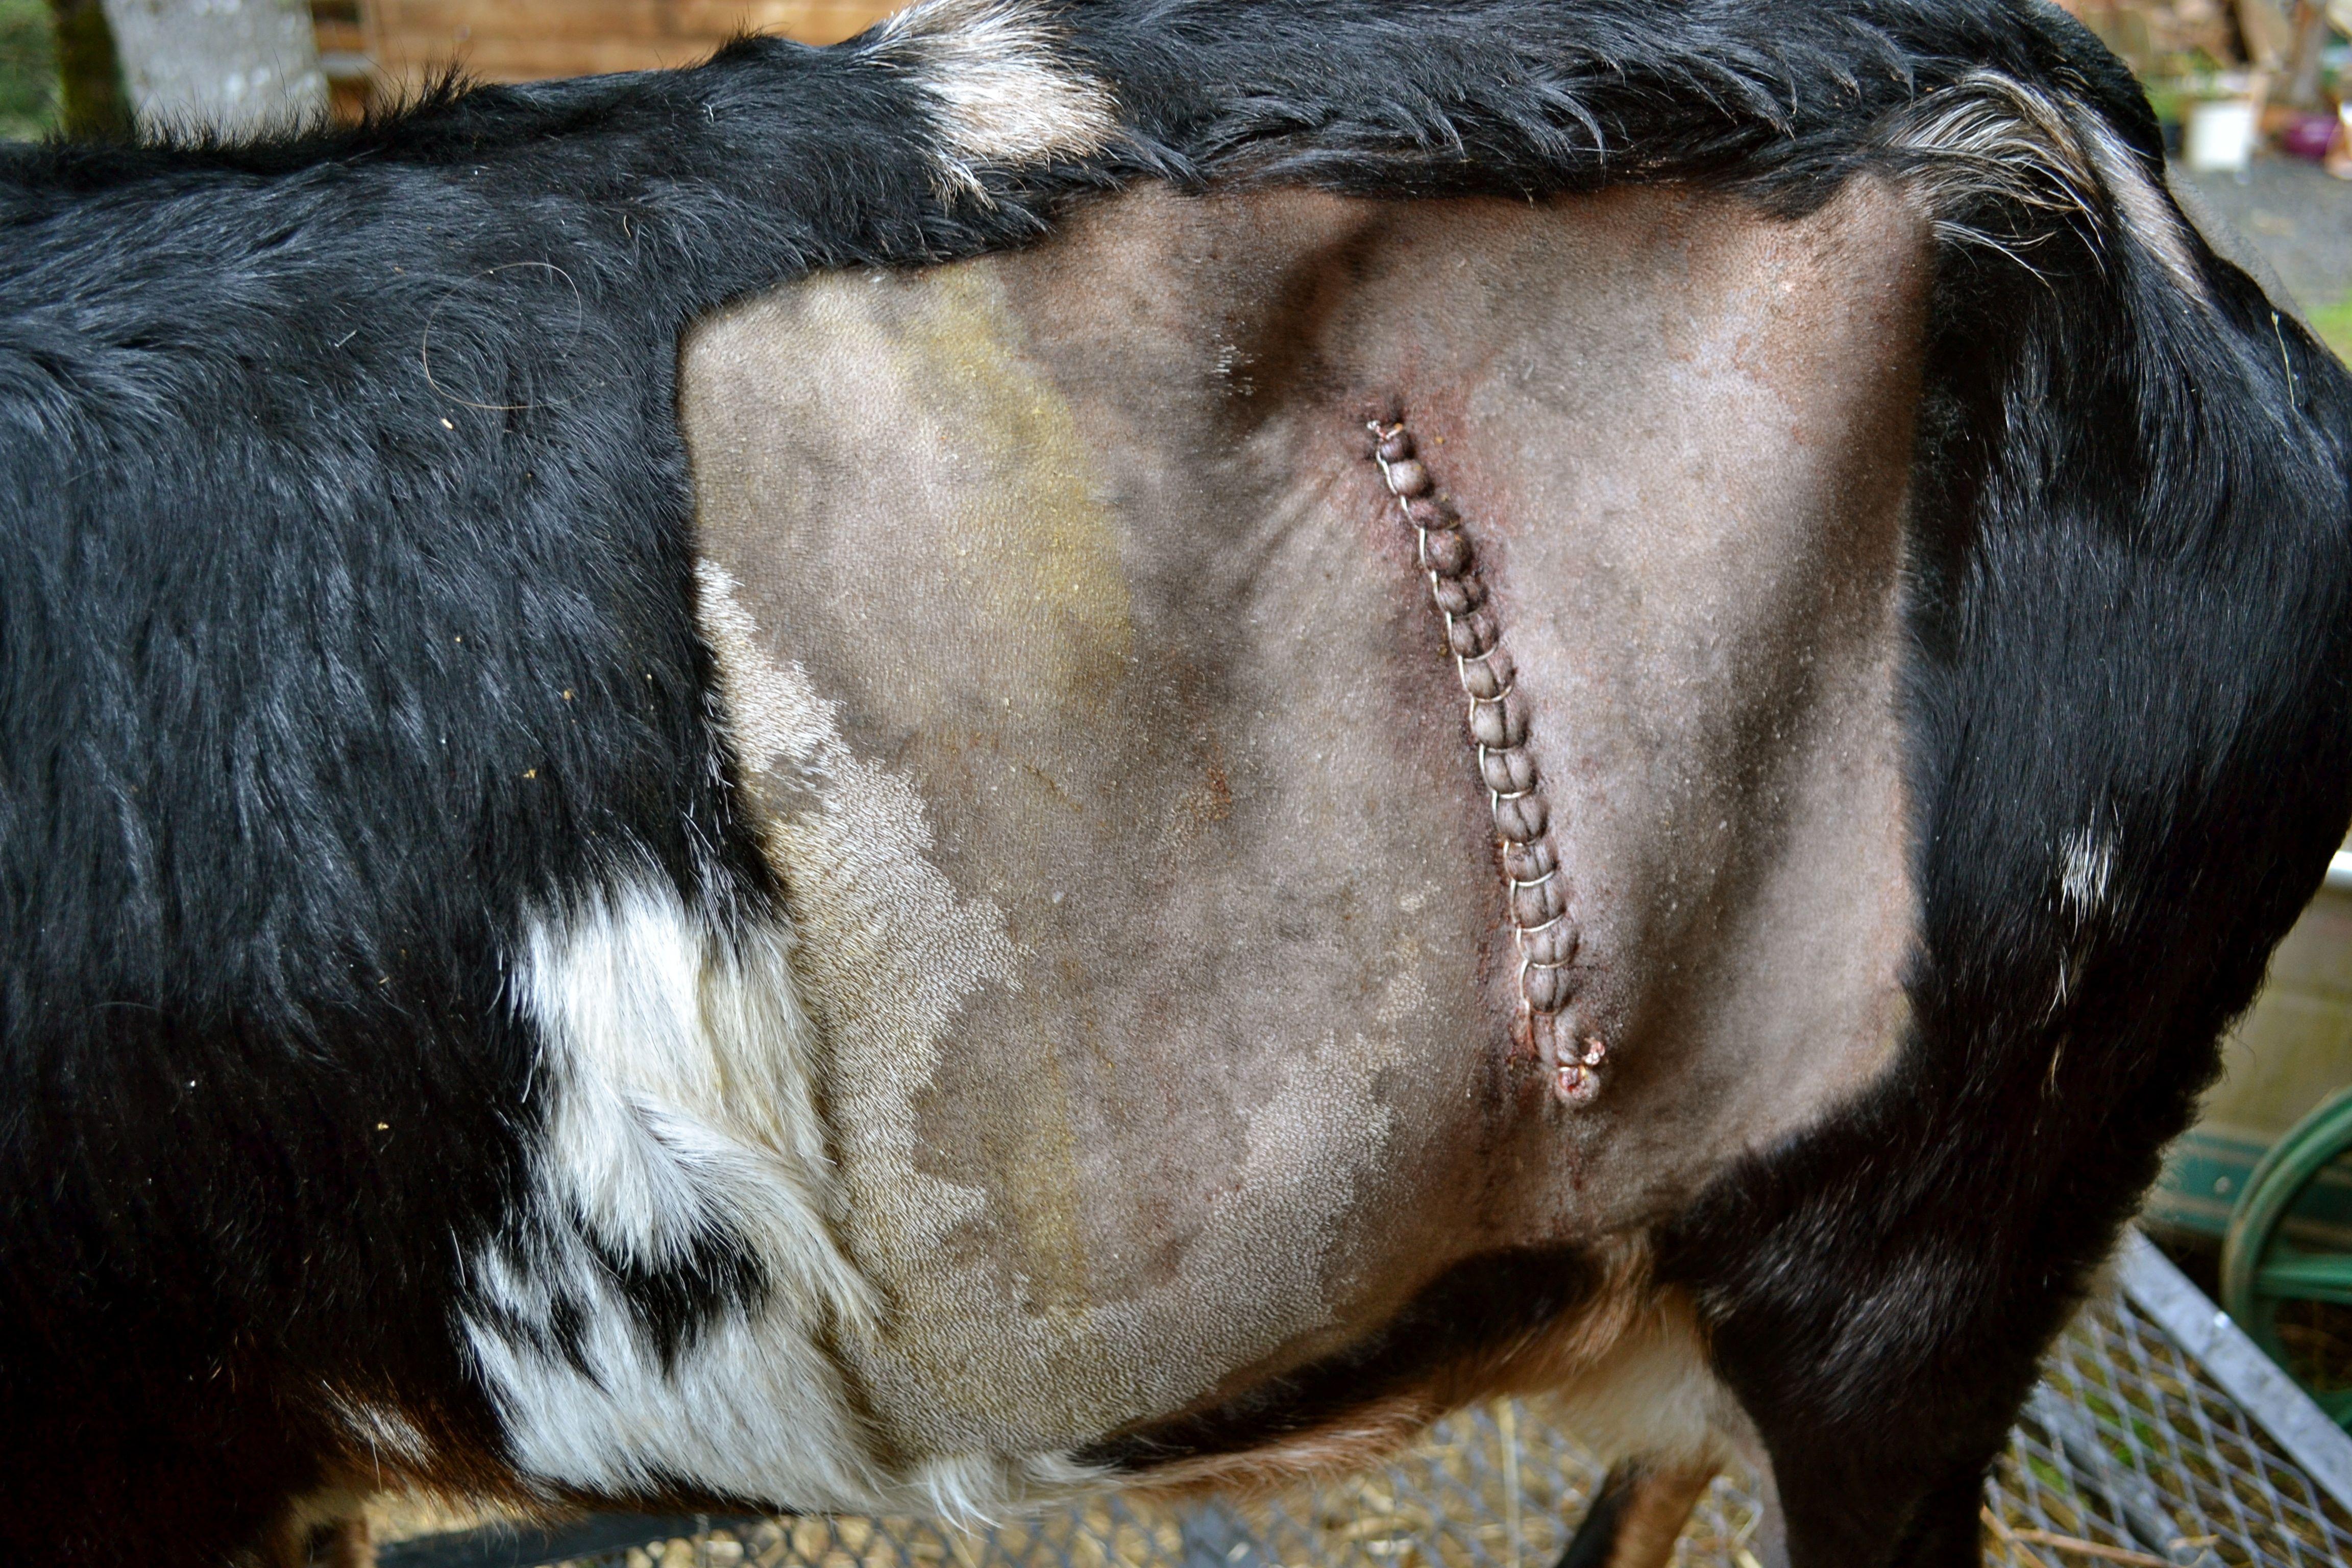 Details of post-partum goat kidding complications